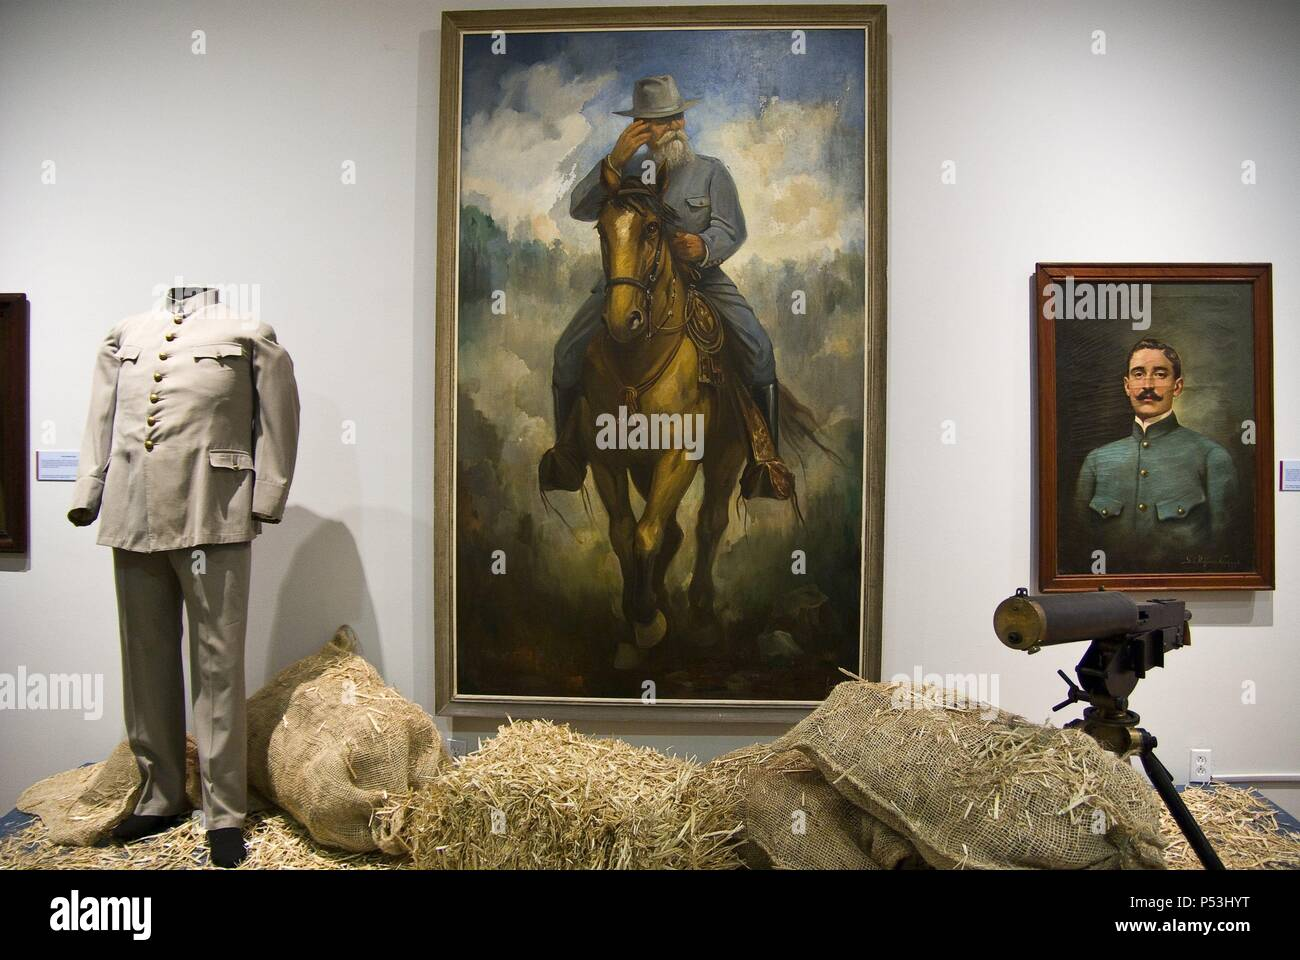 Venustiano Stock Photos & Venustiano Stock Images - Alamy